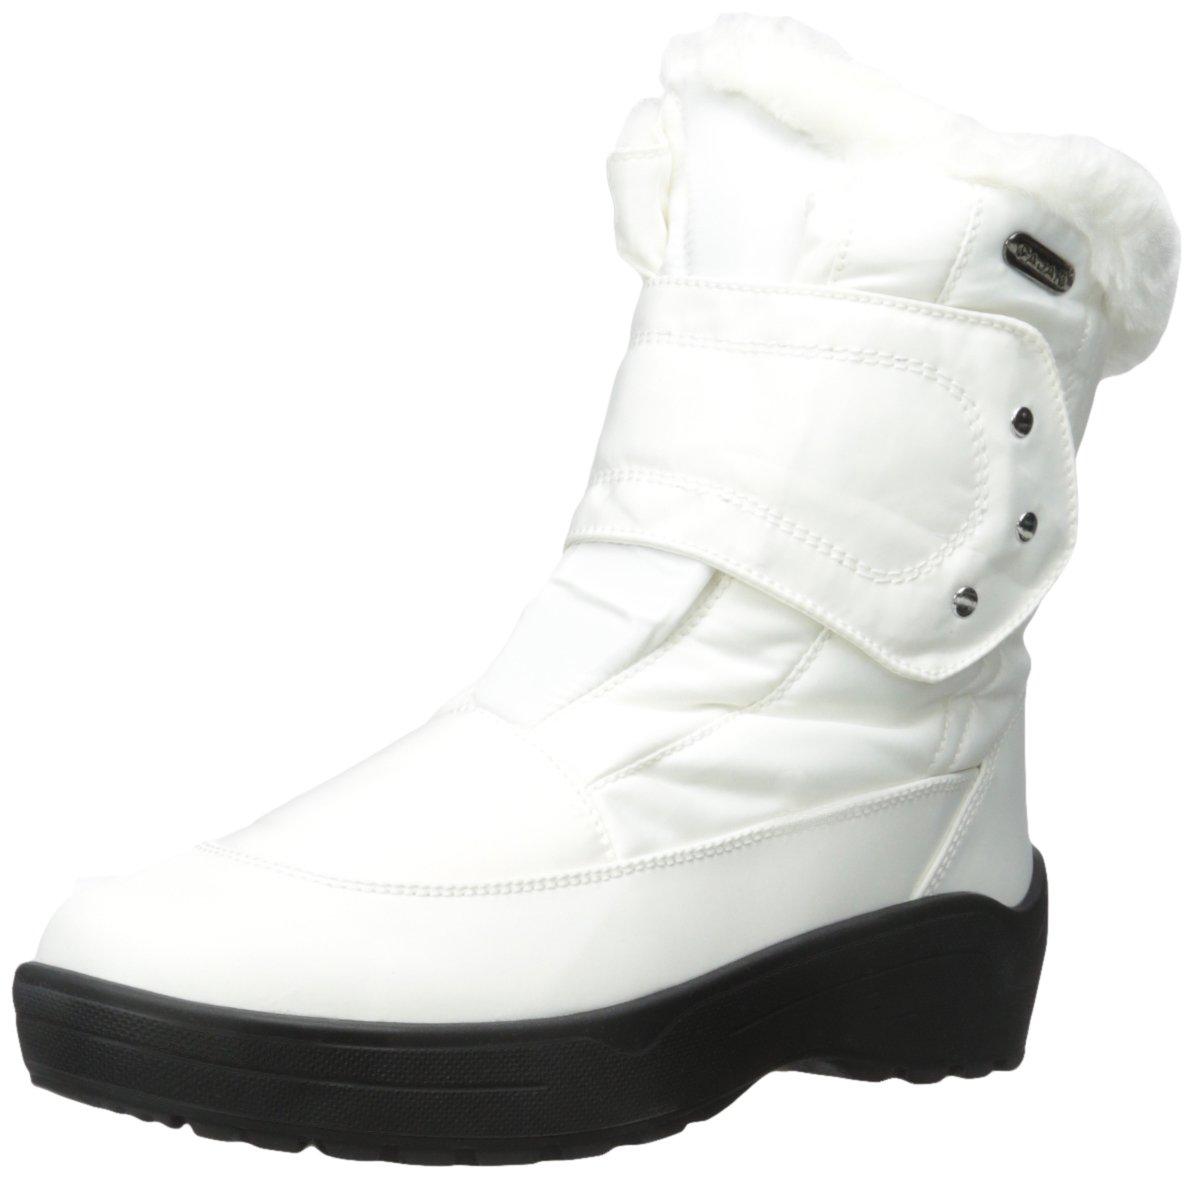 Pajar Women's Moscou-3 Boot B013GI1GIW 41 M EU / 10 B(M) US White